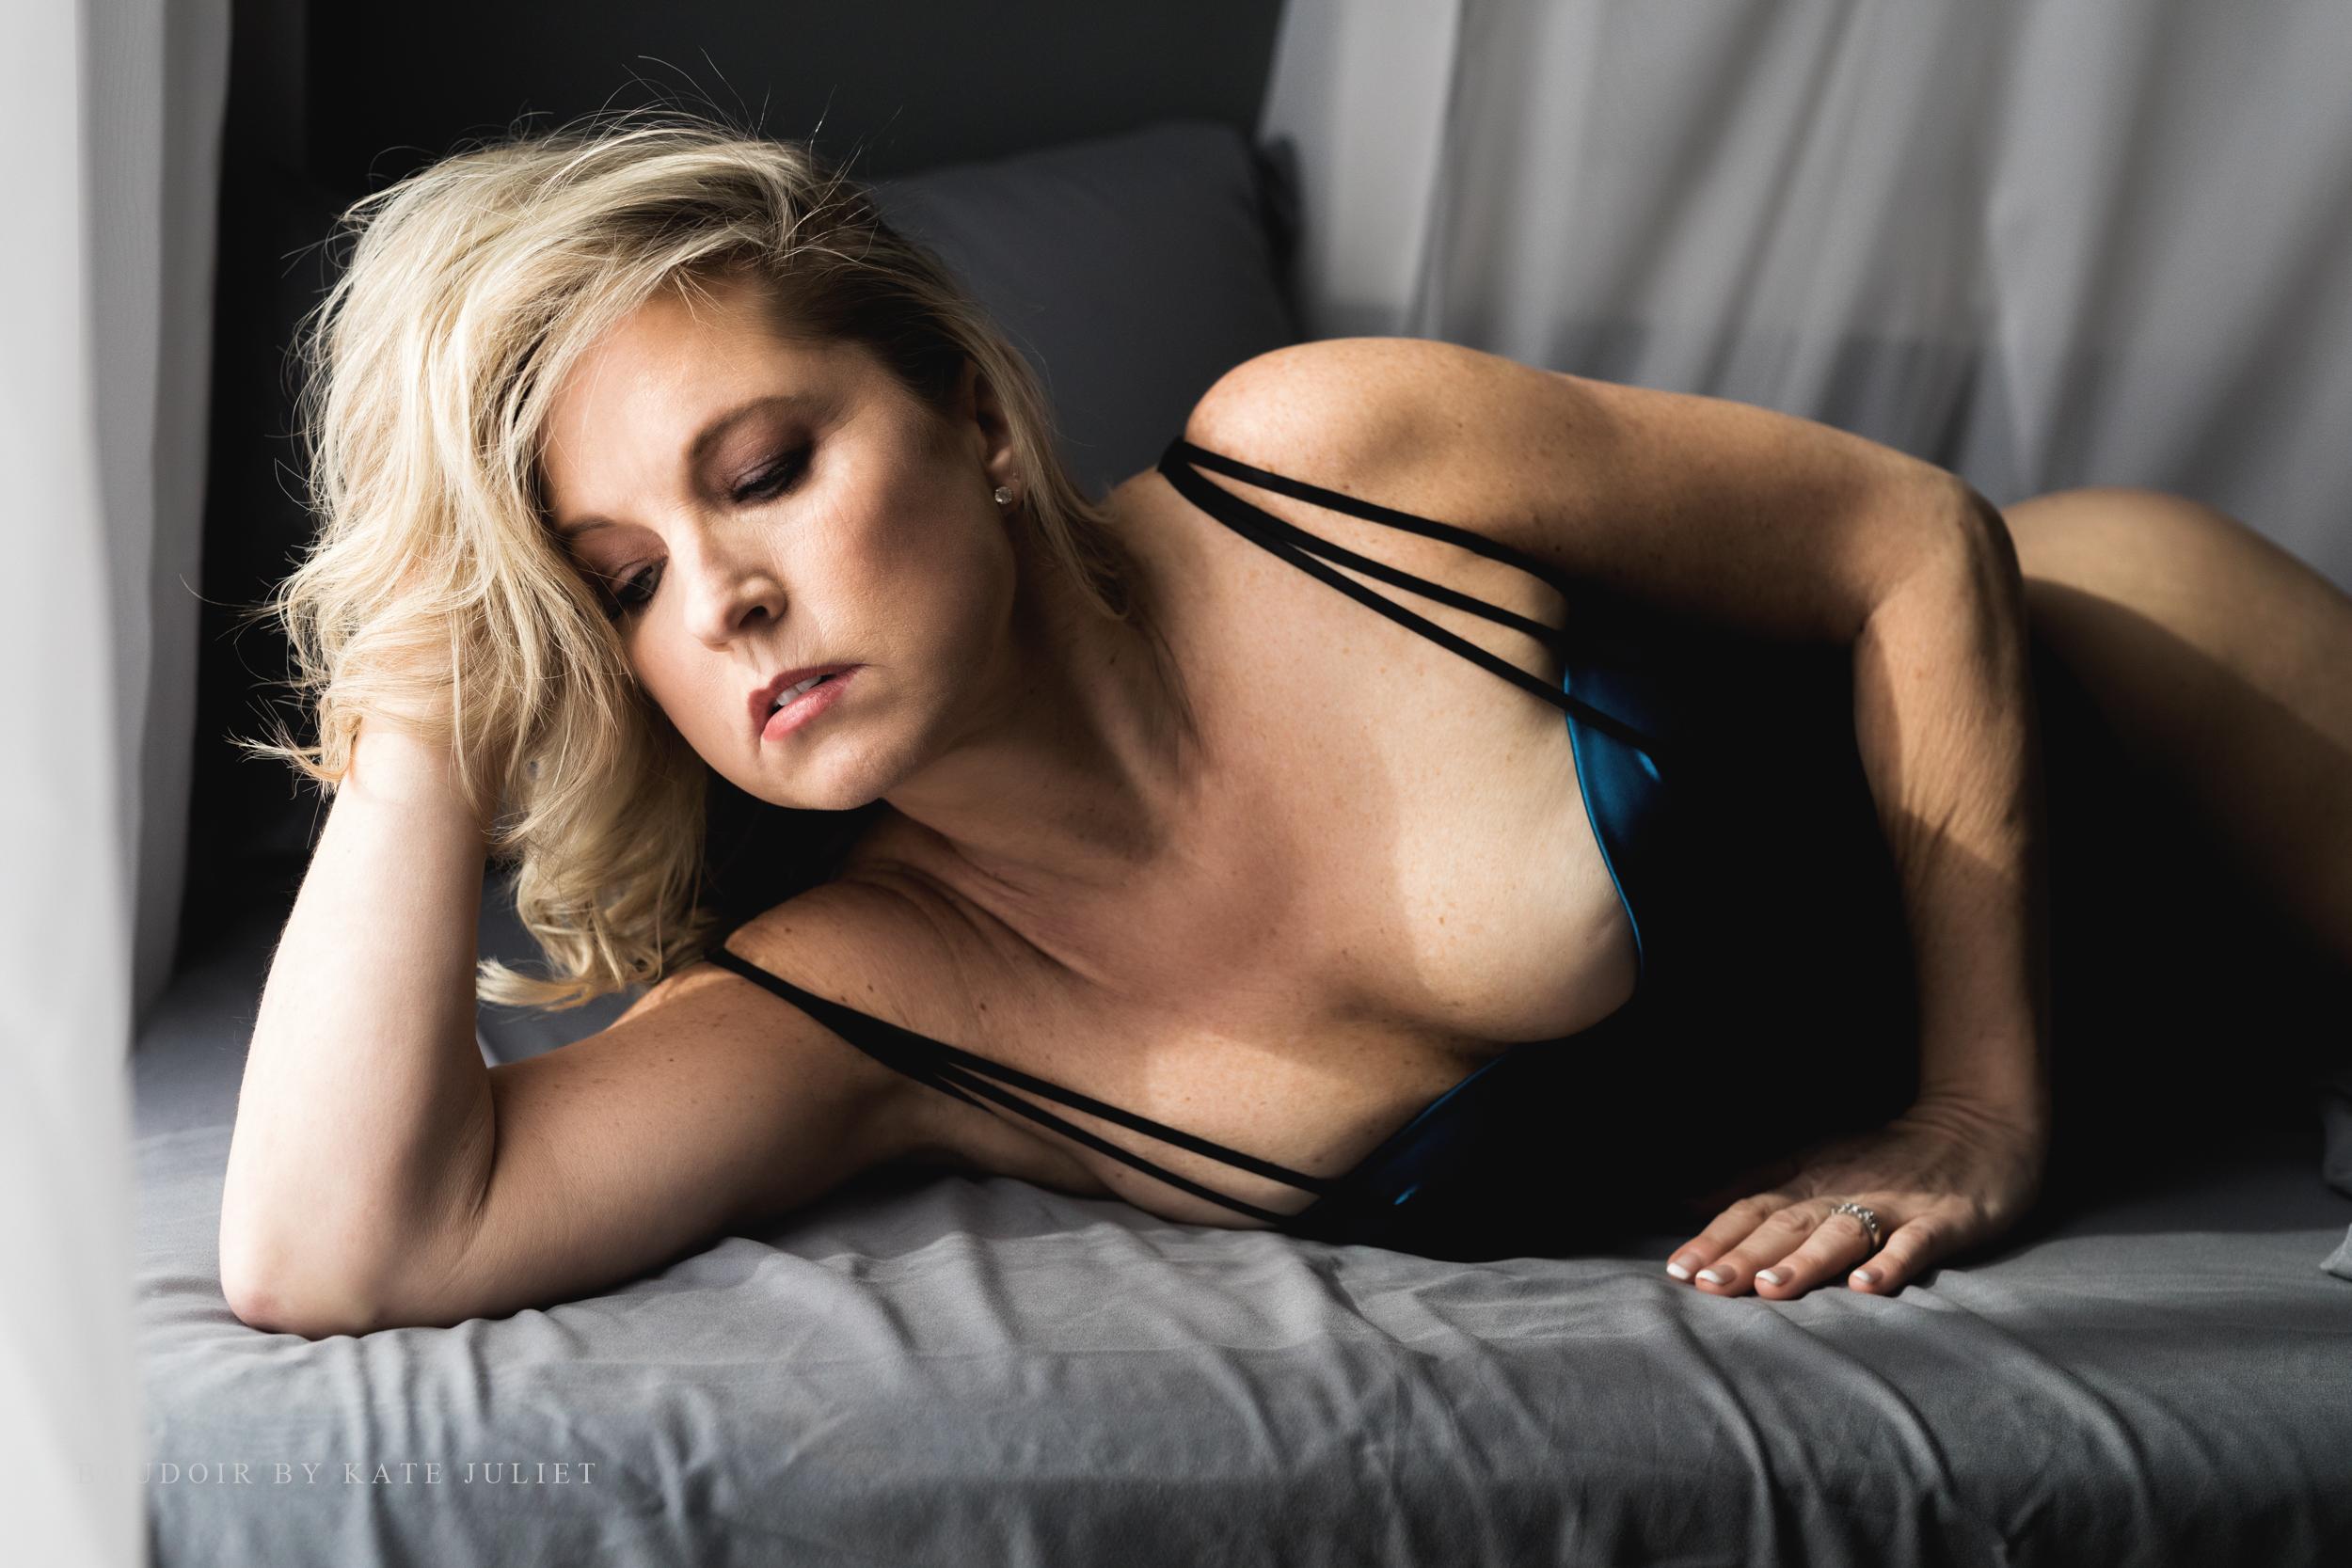 kate juliet photography - boudoir - web-95.jpg